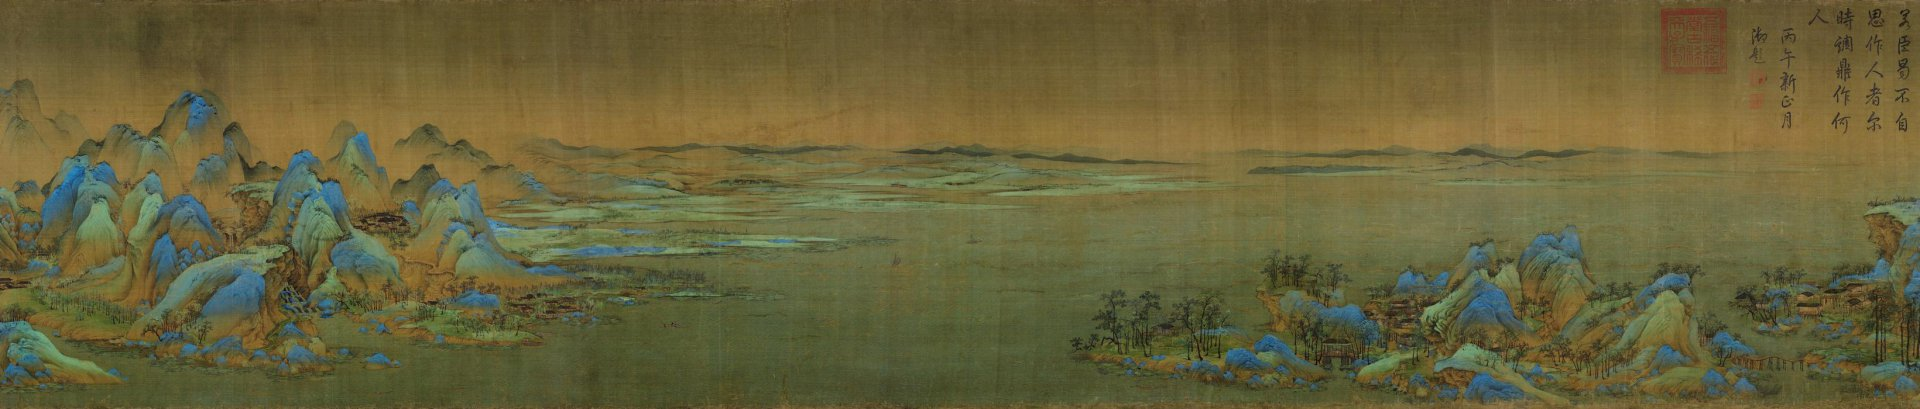 5.t1e_Wang_Ximeng._A_Thousand_Li_of_Rivers_and_Mountains._.jpg